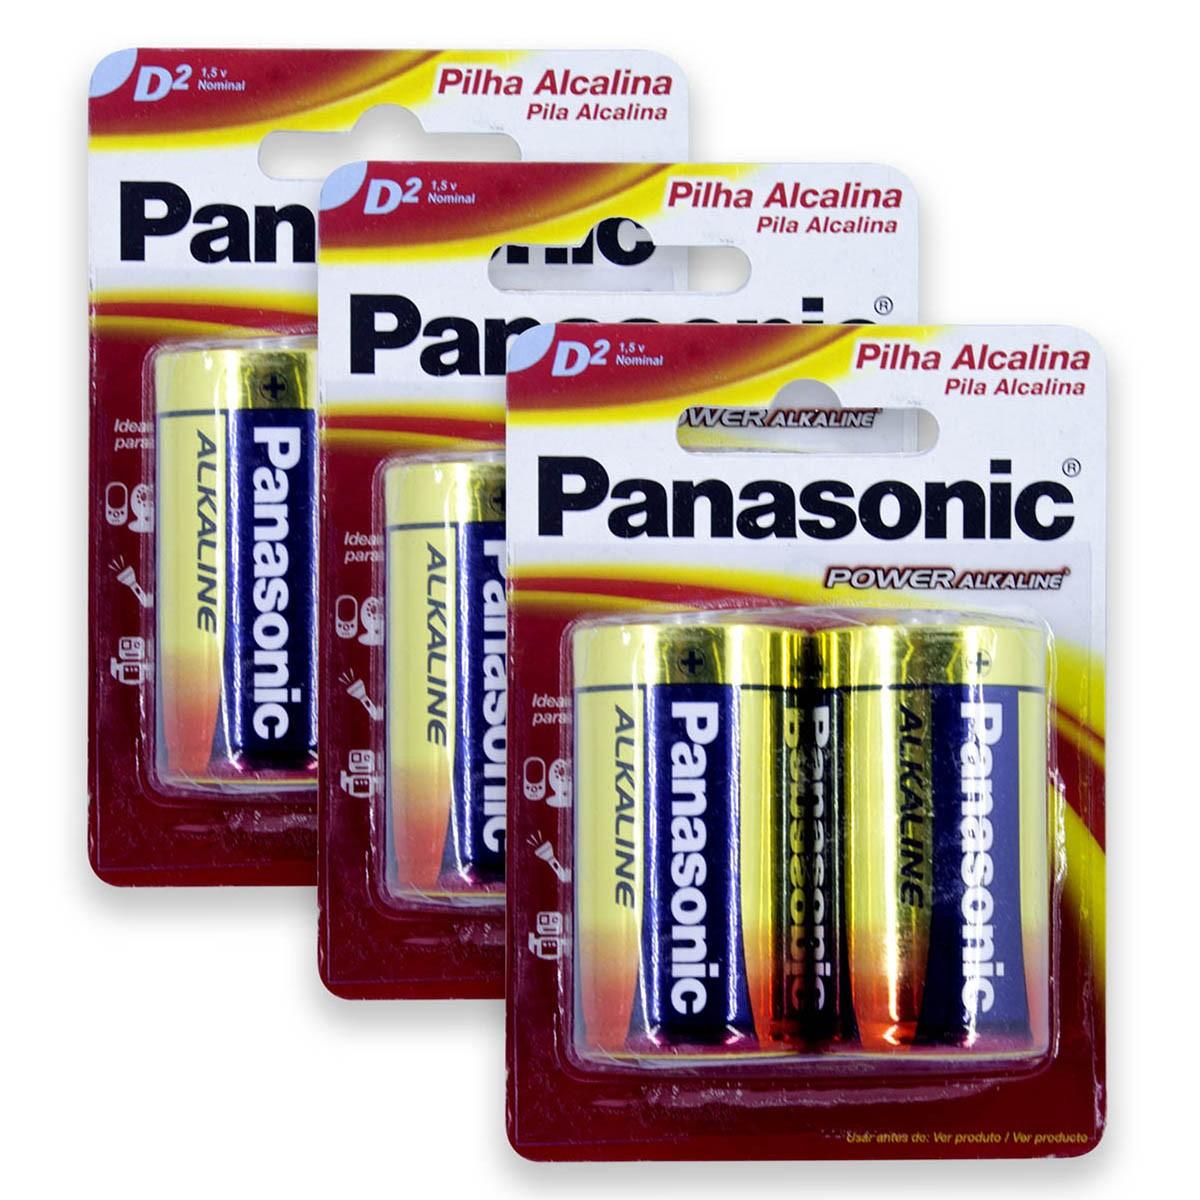 06 Pilhas D Grande LR20 Alcalina PANASONIC 3 Cartelas